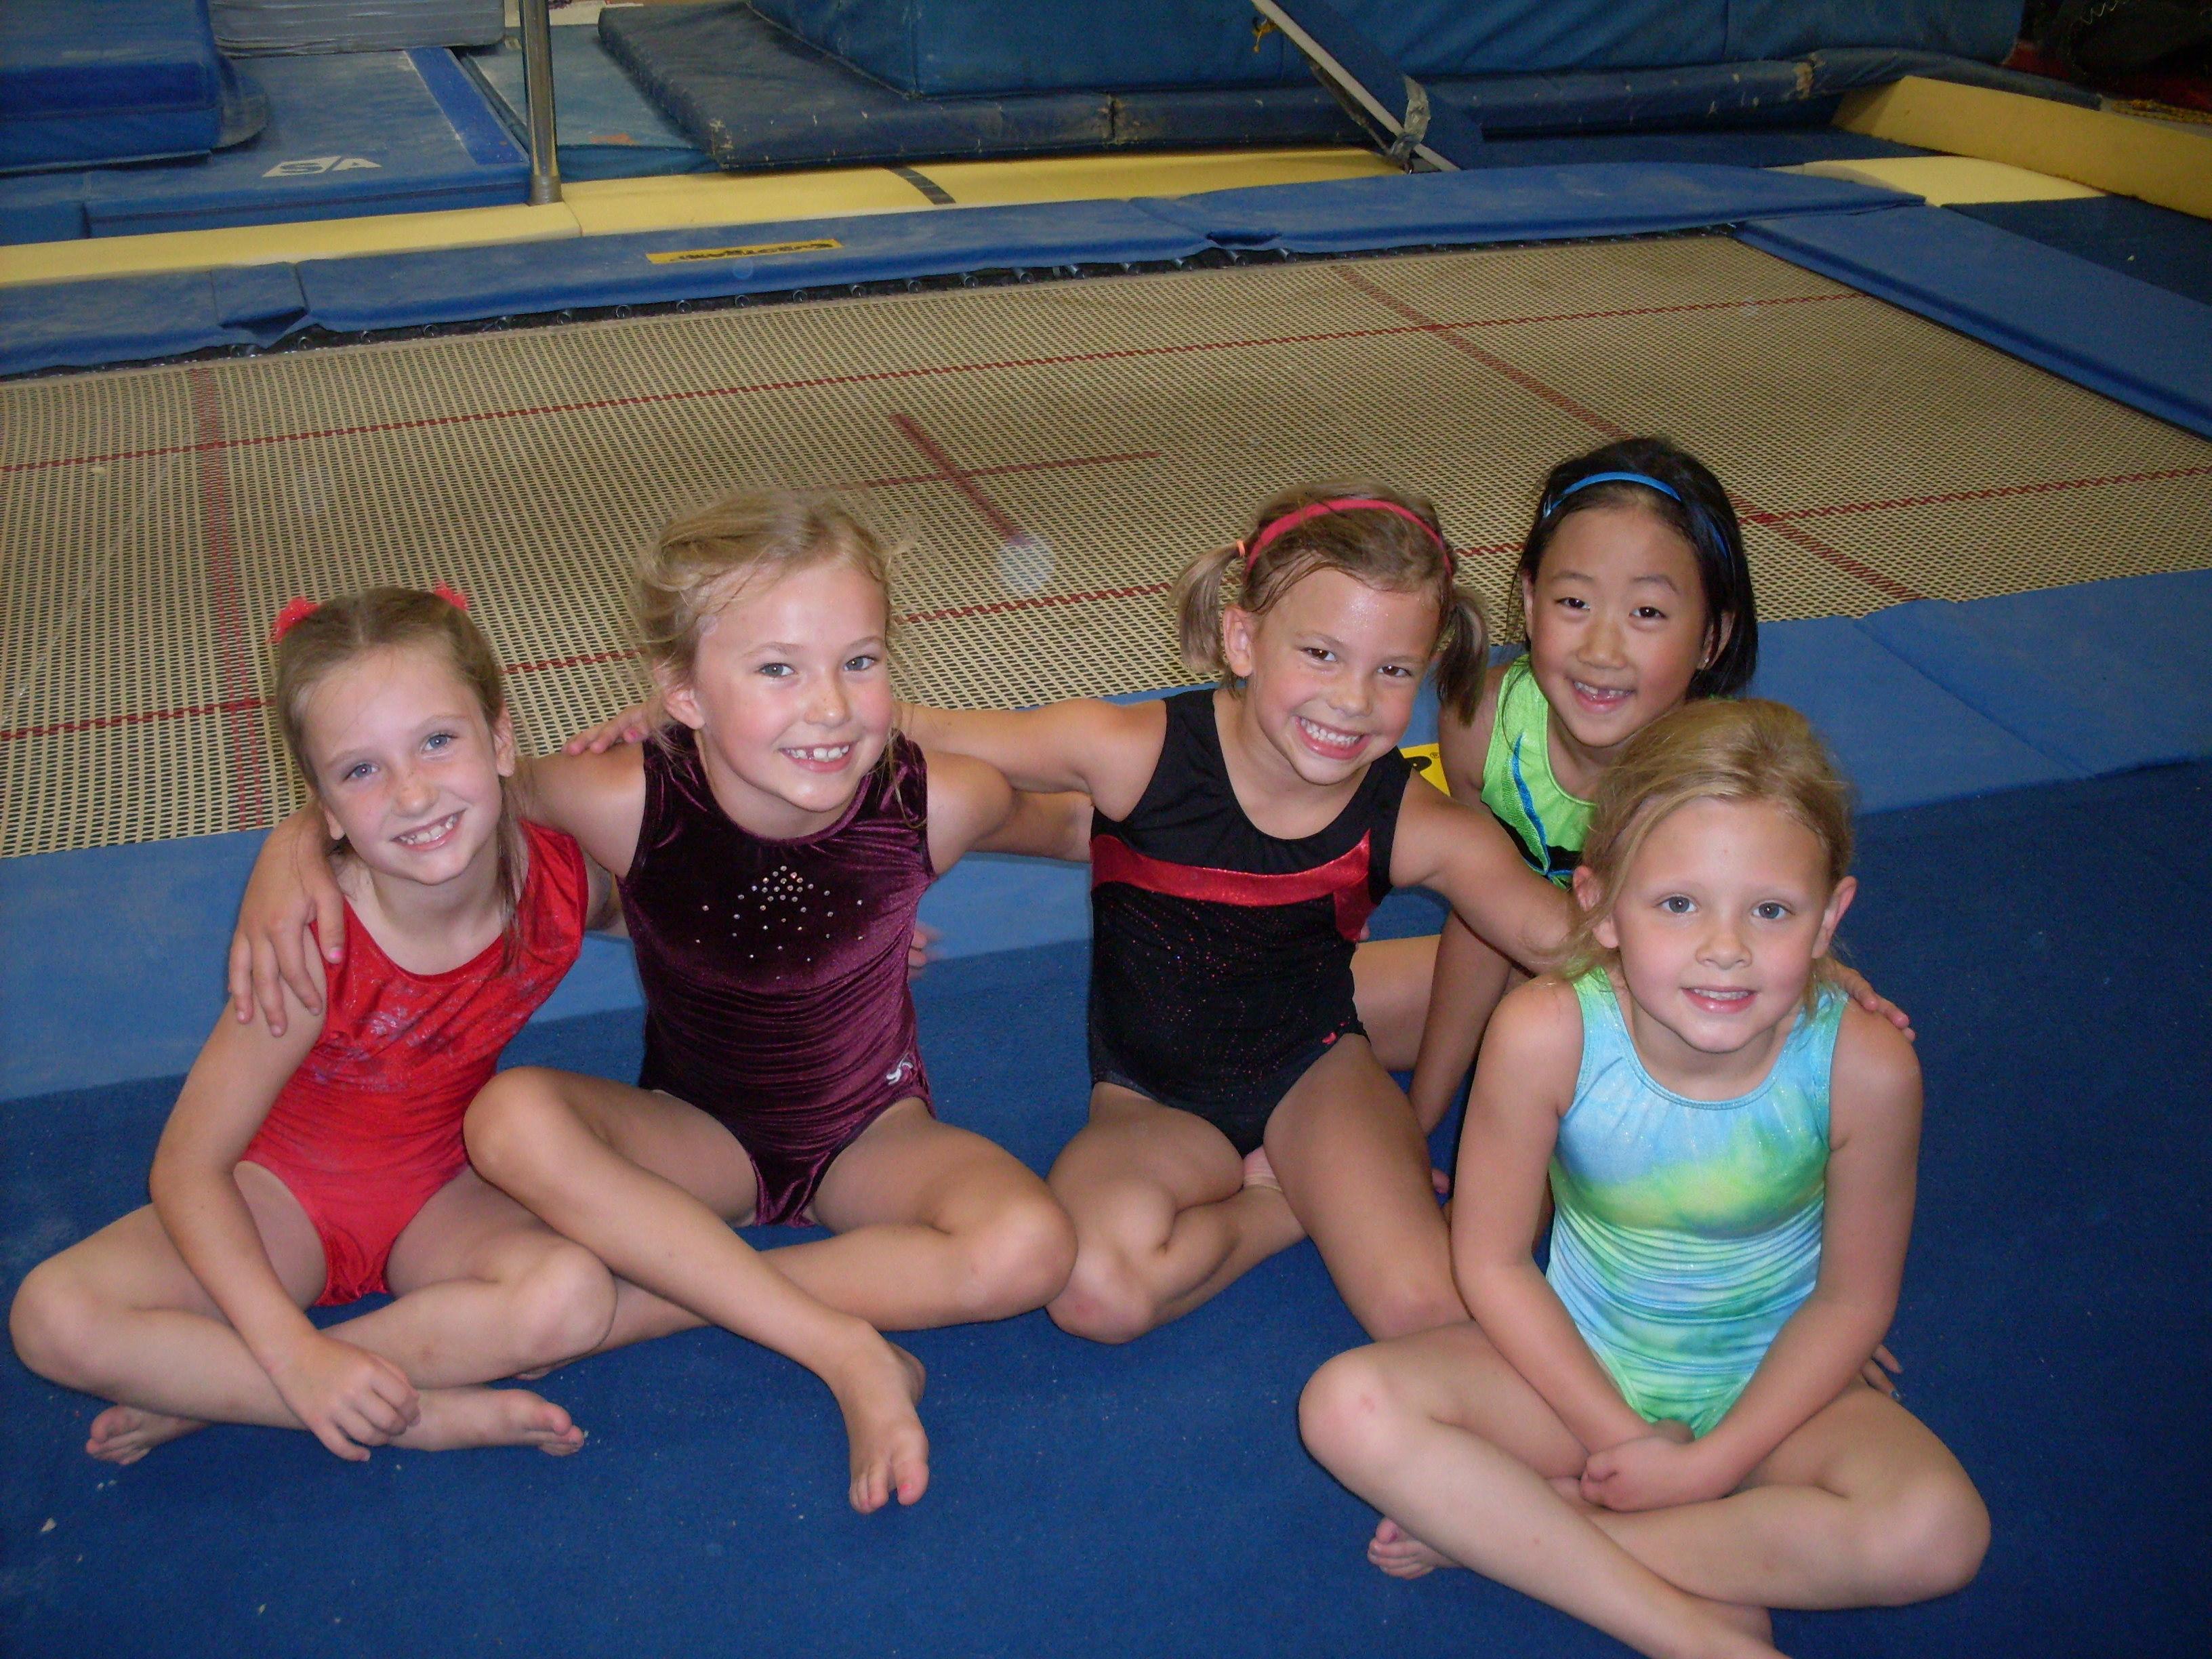 Legacy Gymnastics image 1